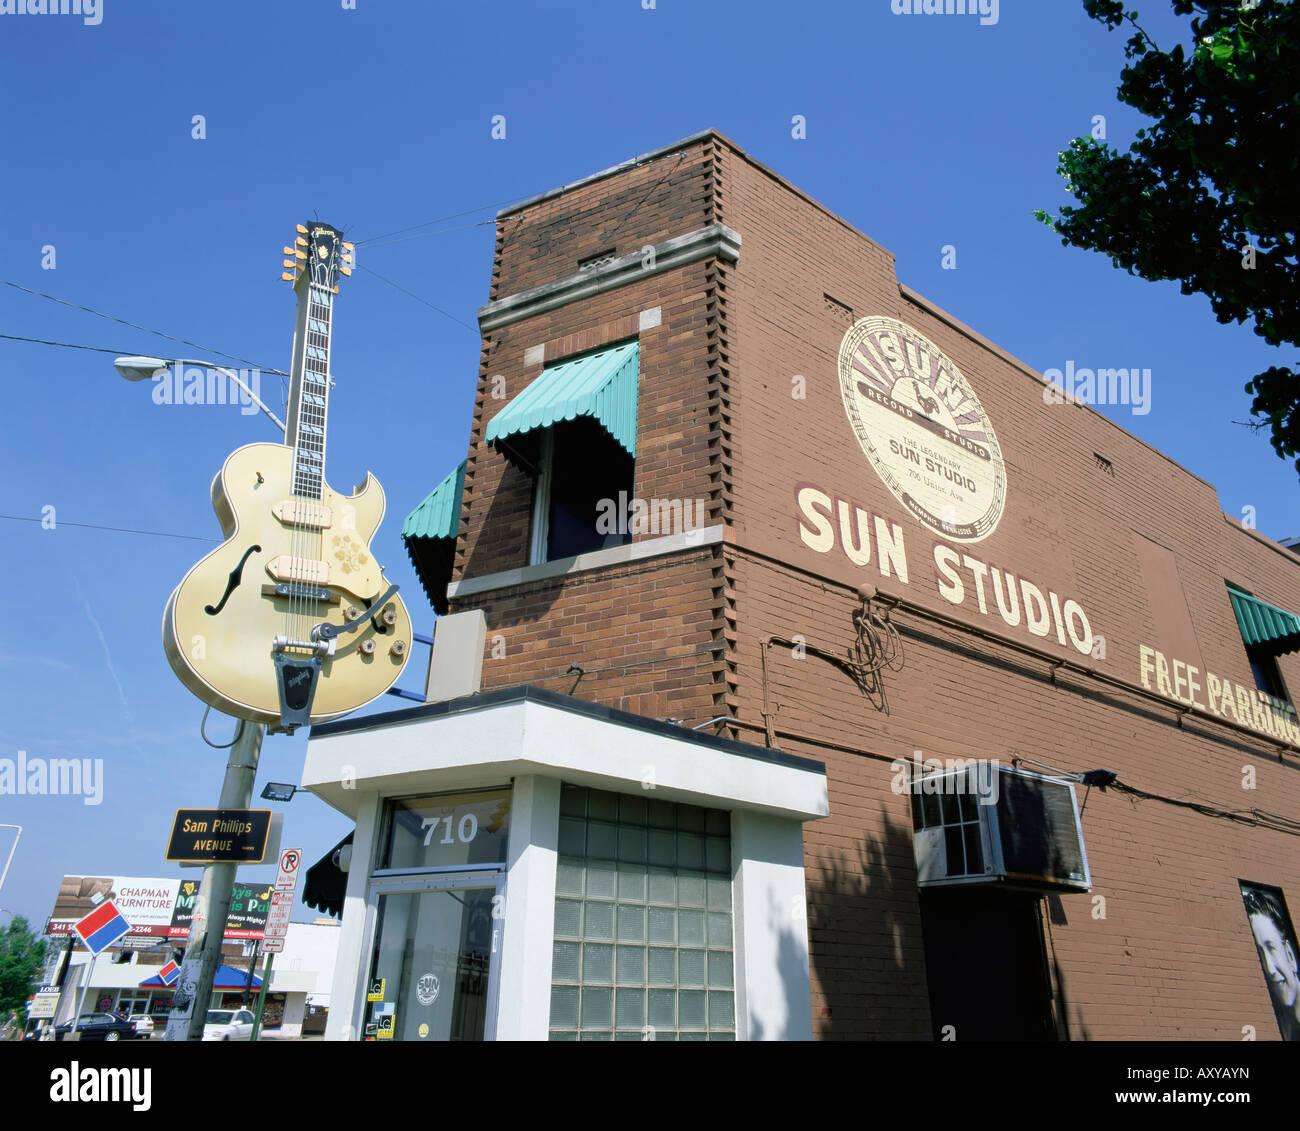 Sun Studios, Memphis, Tennessee, United States of America, North America - Stock Image